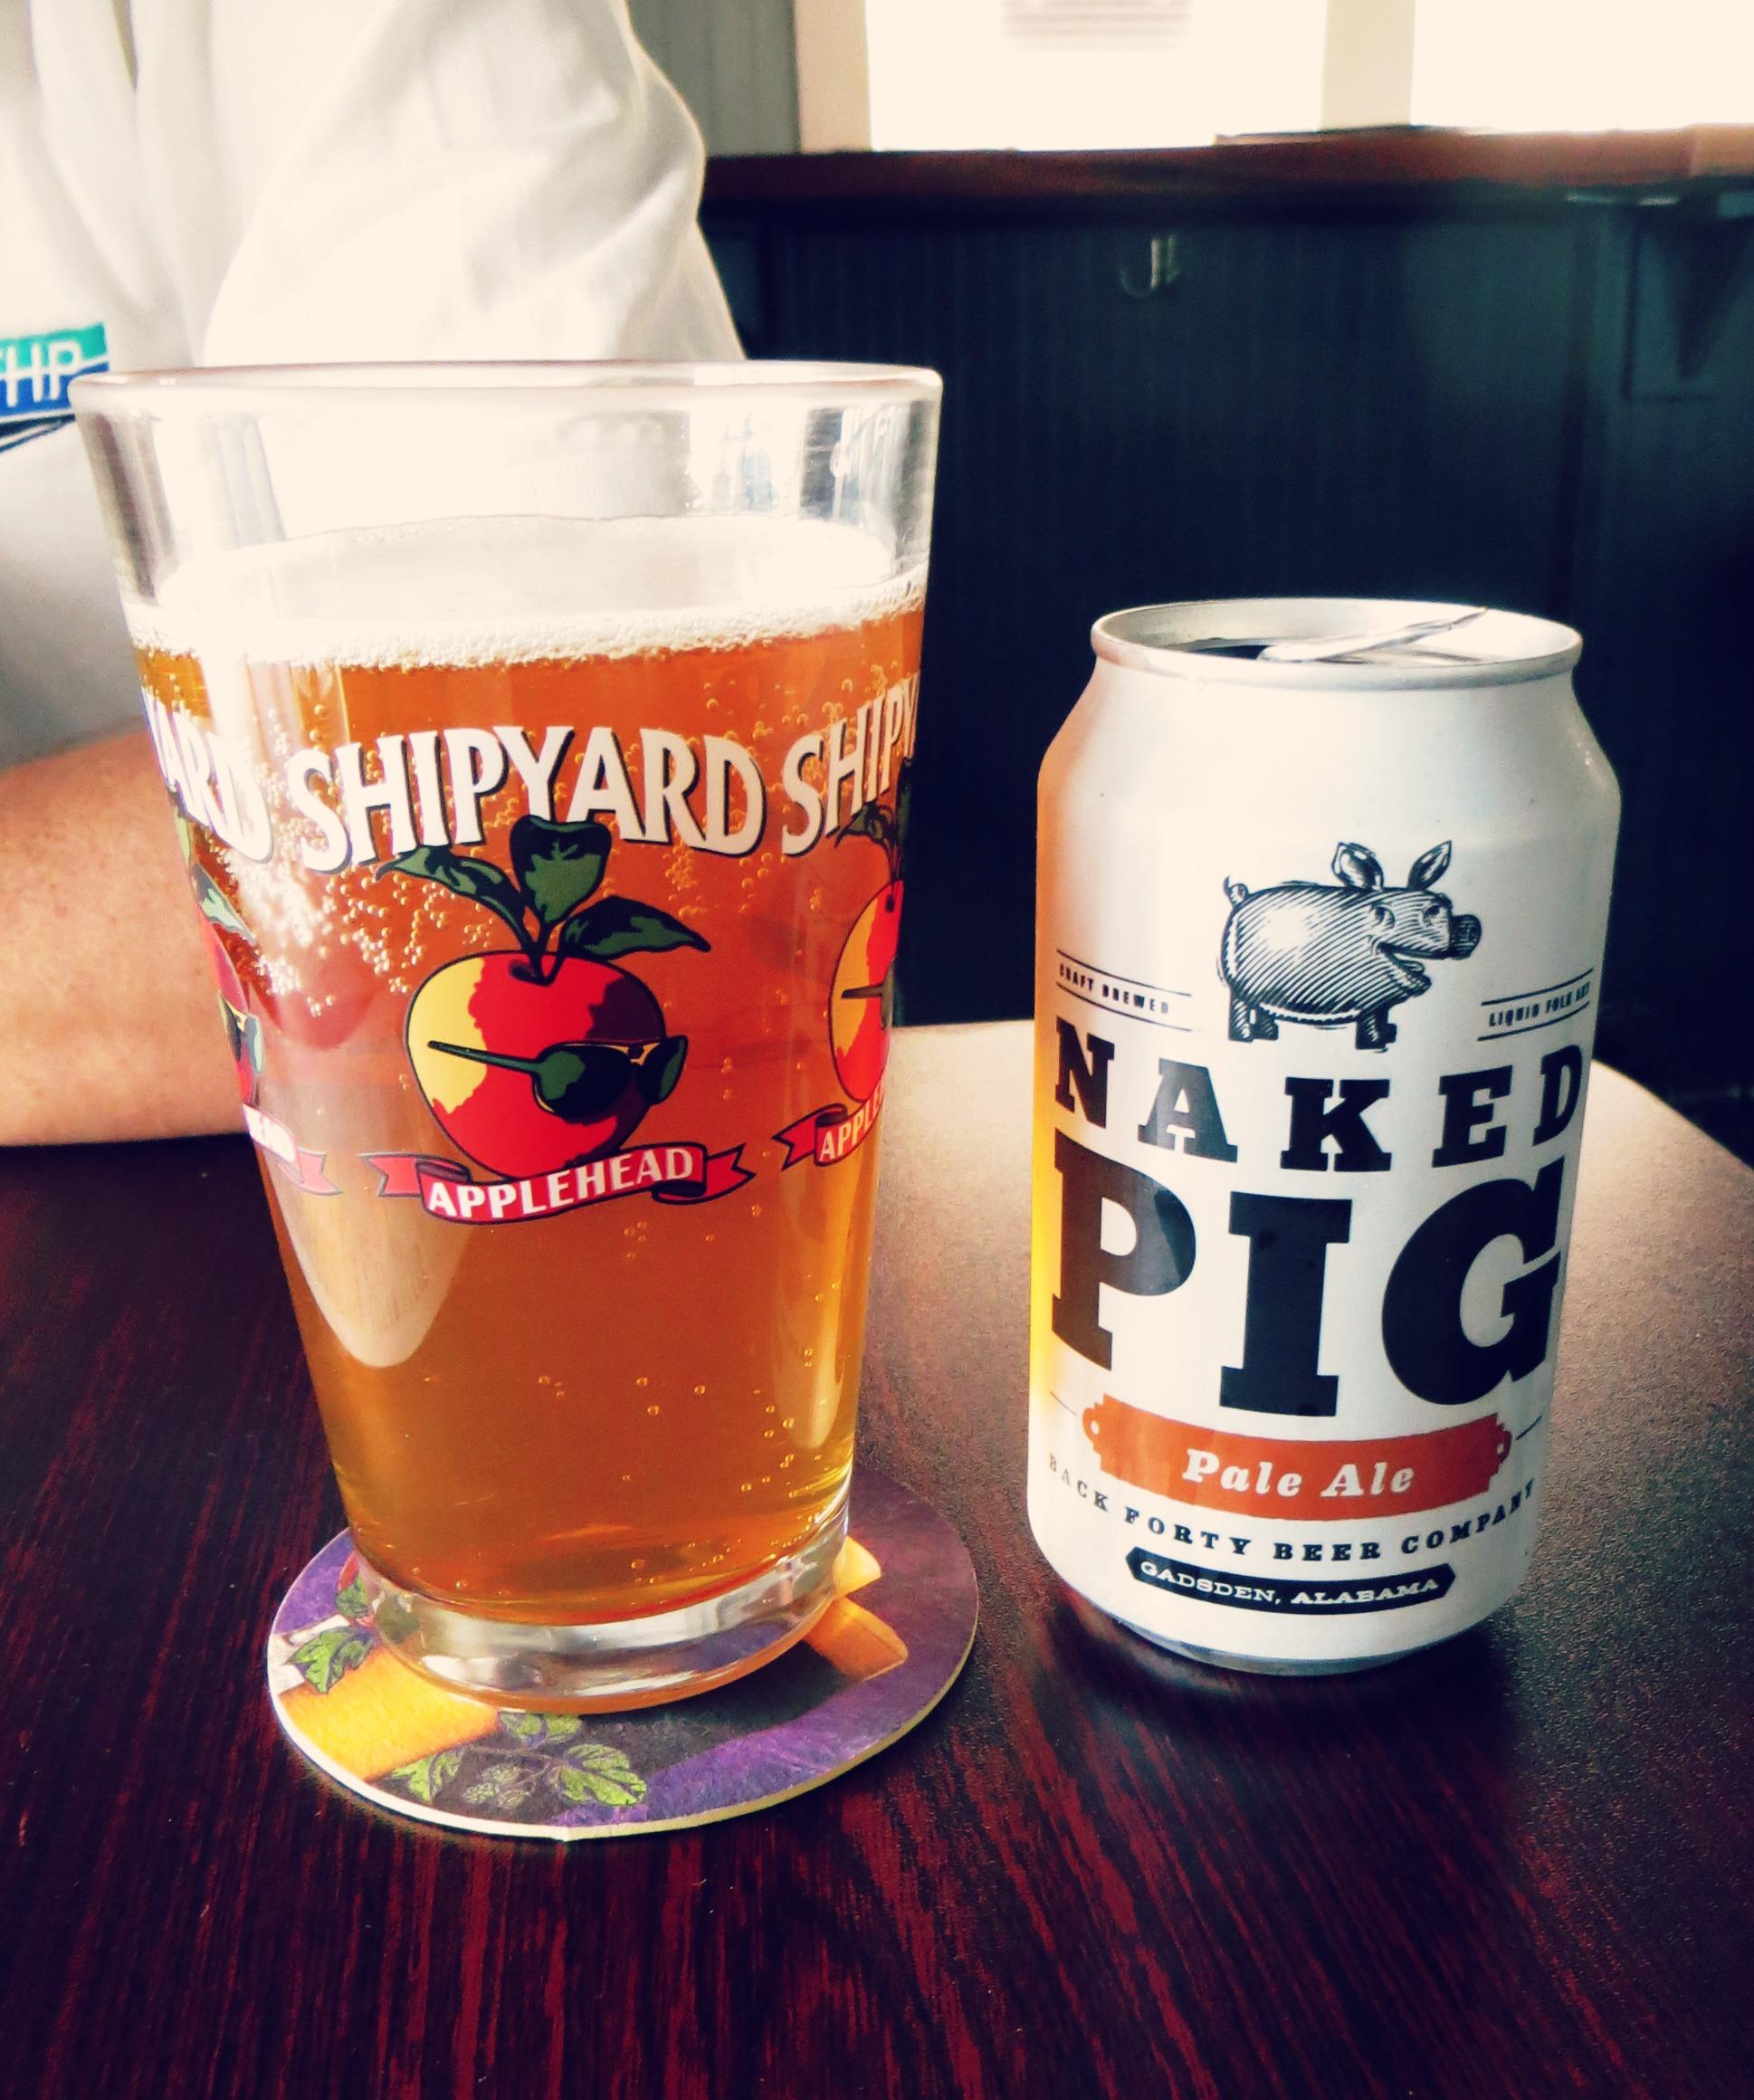 Naked Pig Pale Ale | The Magnolia | Pensacola, Florida